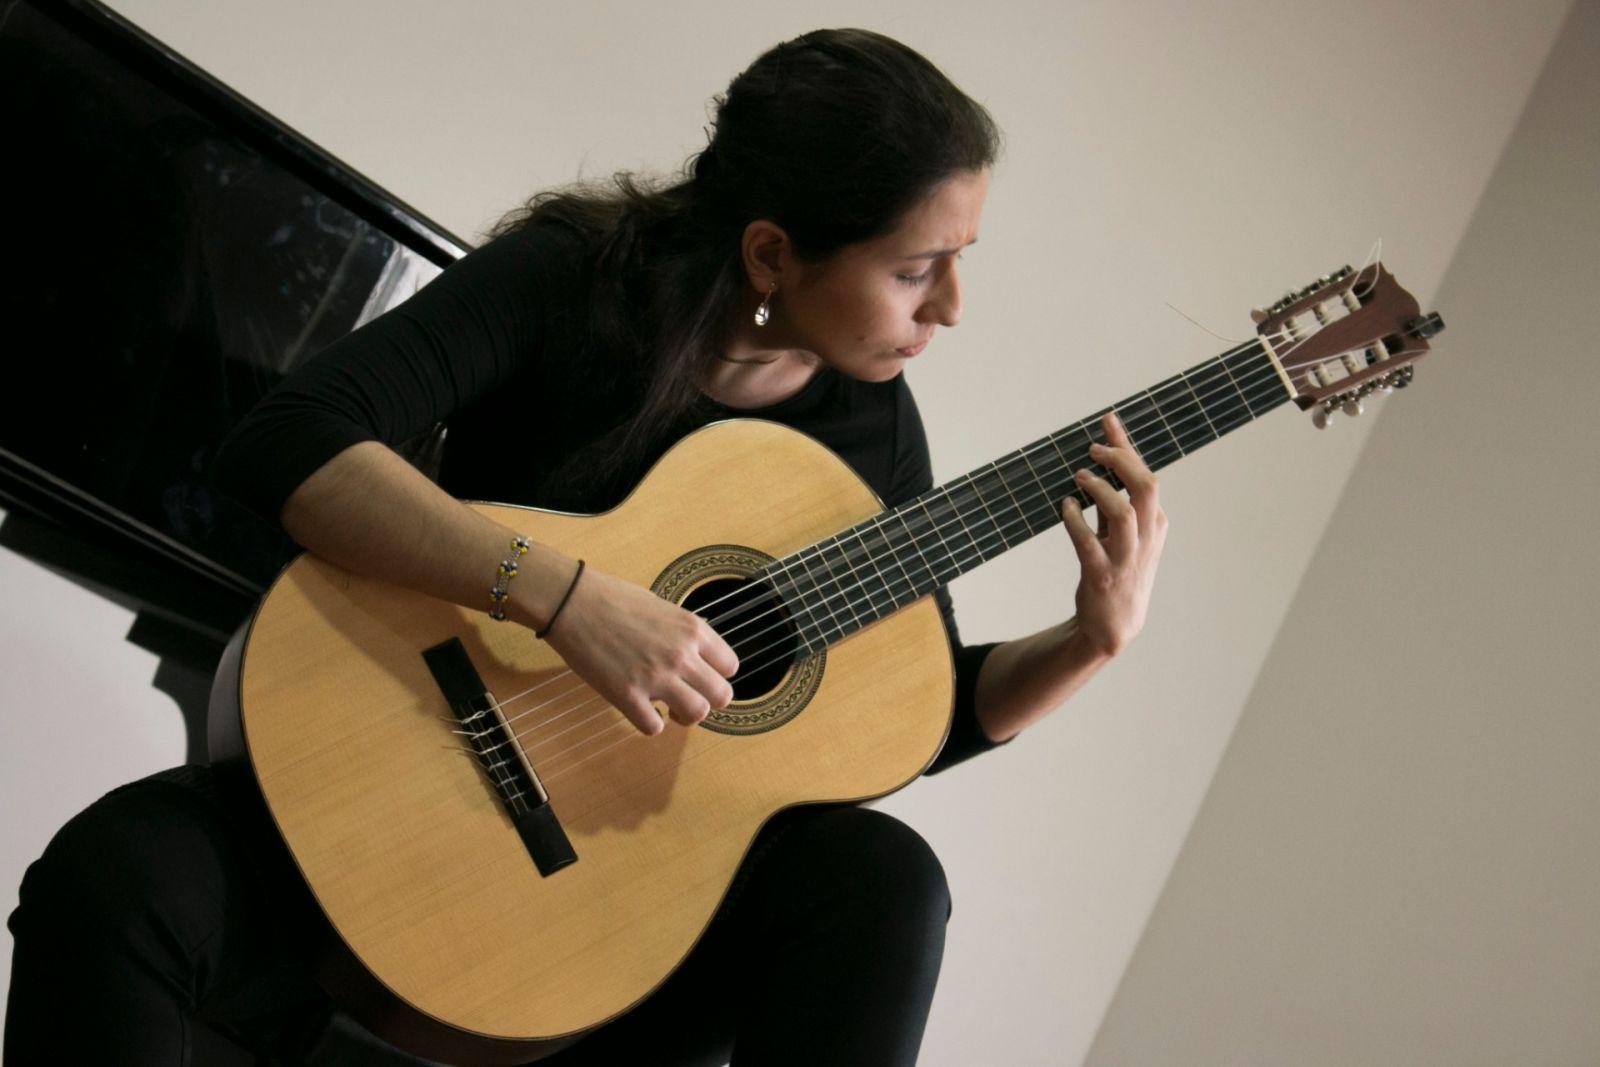 Concerto na Toca reúne mulheres violonistas ao vivo no Instagram - Thaís Nascimento